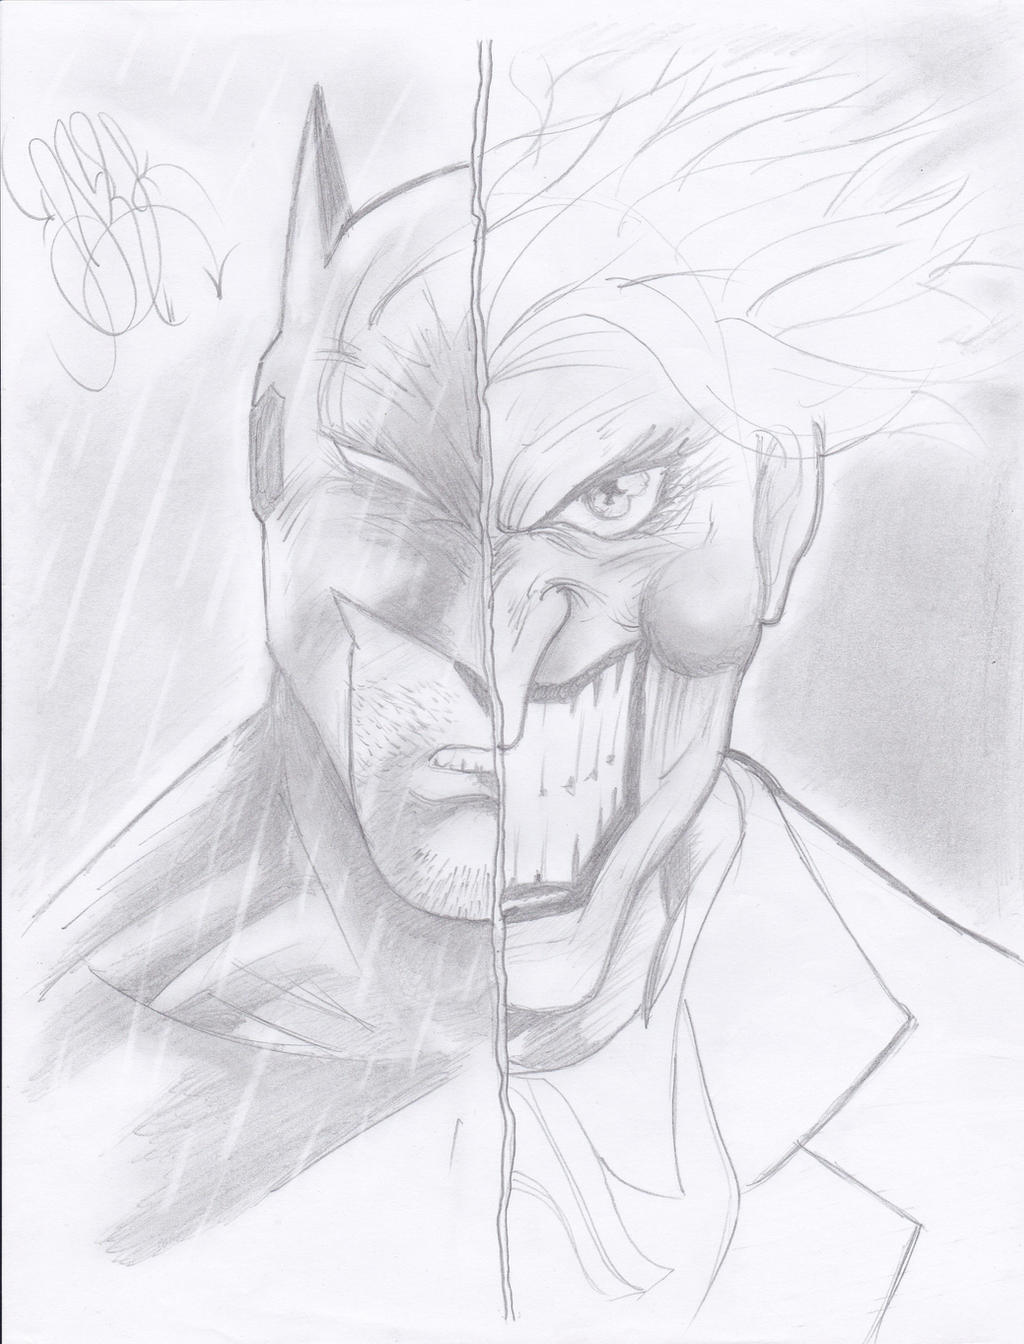 pencil draw batman and joker by naruto2312 on DeviantArt